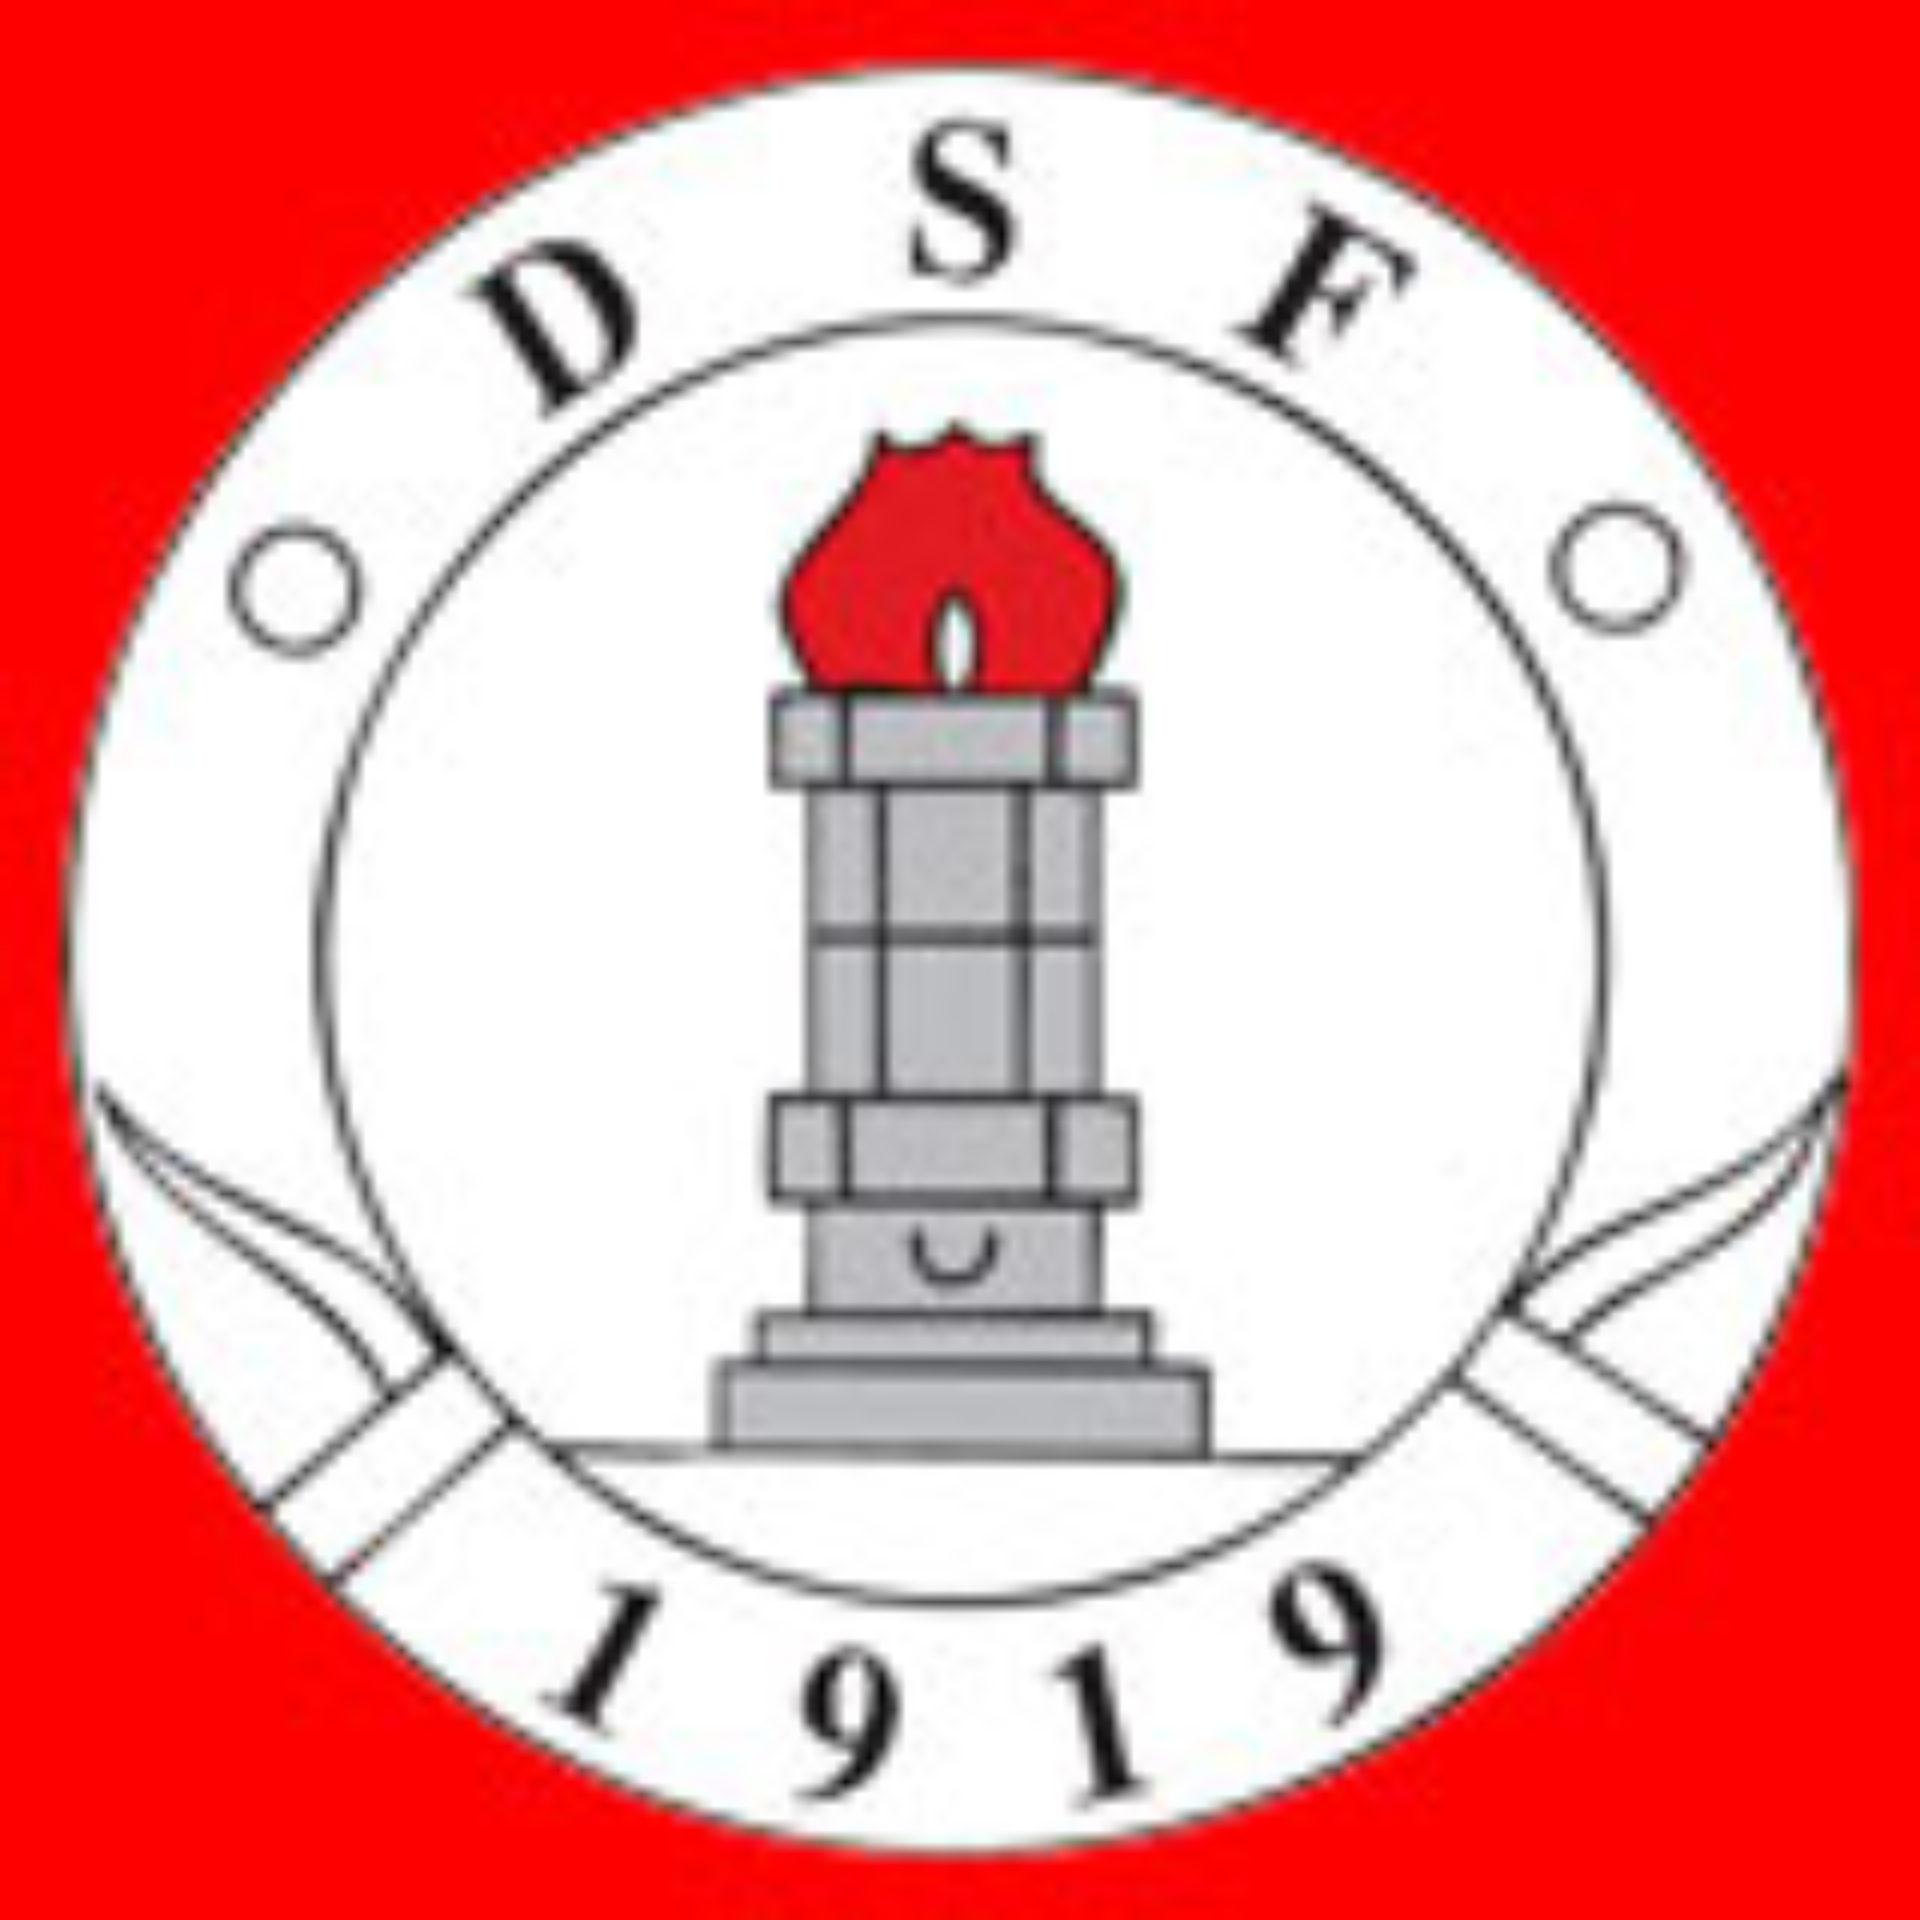 Danmarks Støberitekniske Forening